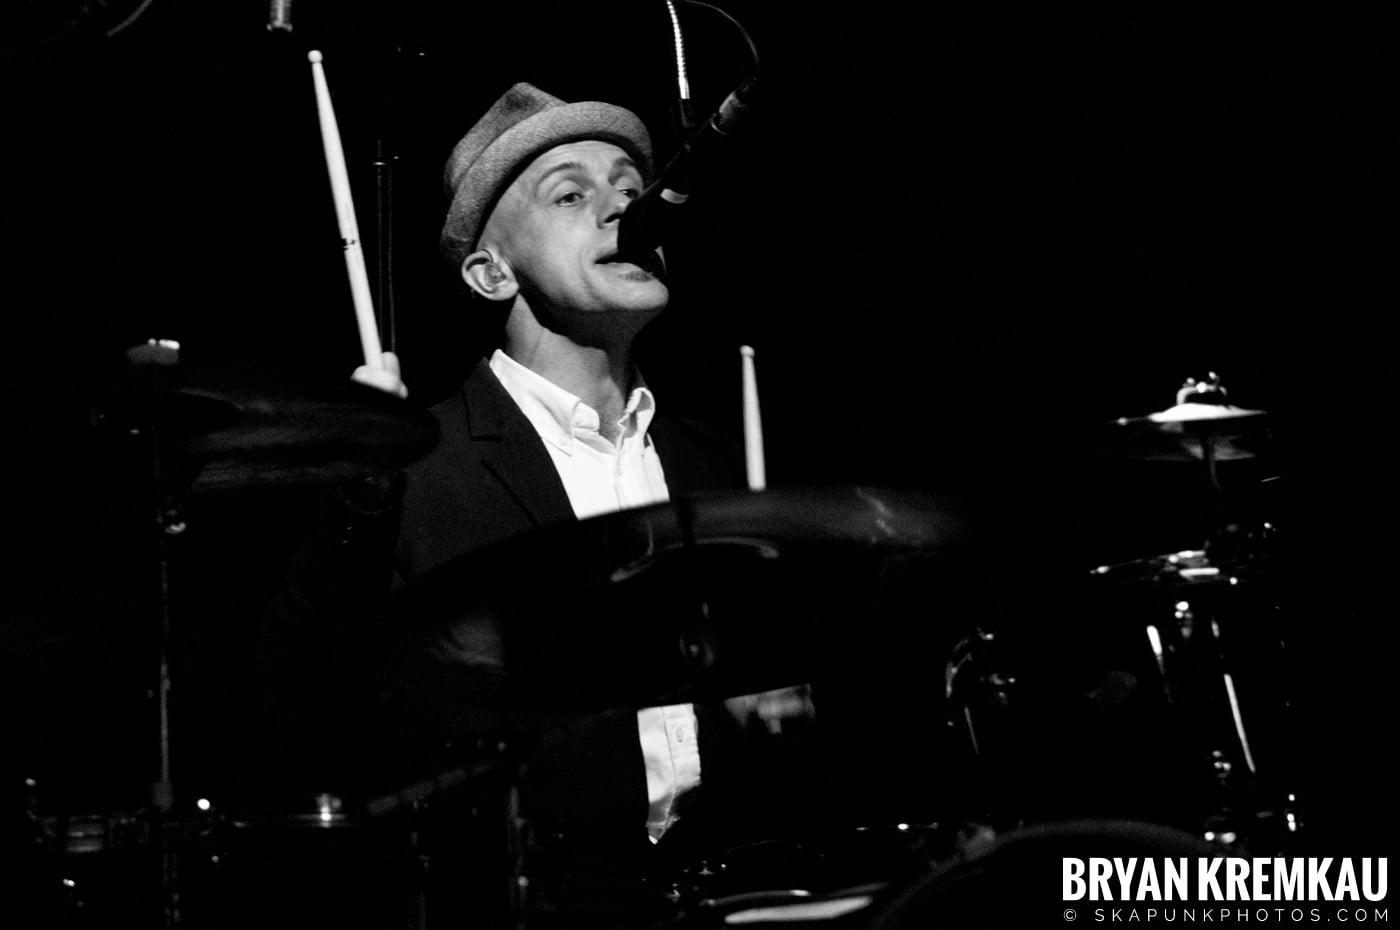 Frank Turner & The Sleeping Souls @ Webster Hall, NYC - 9.29.12 (30)